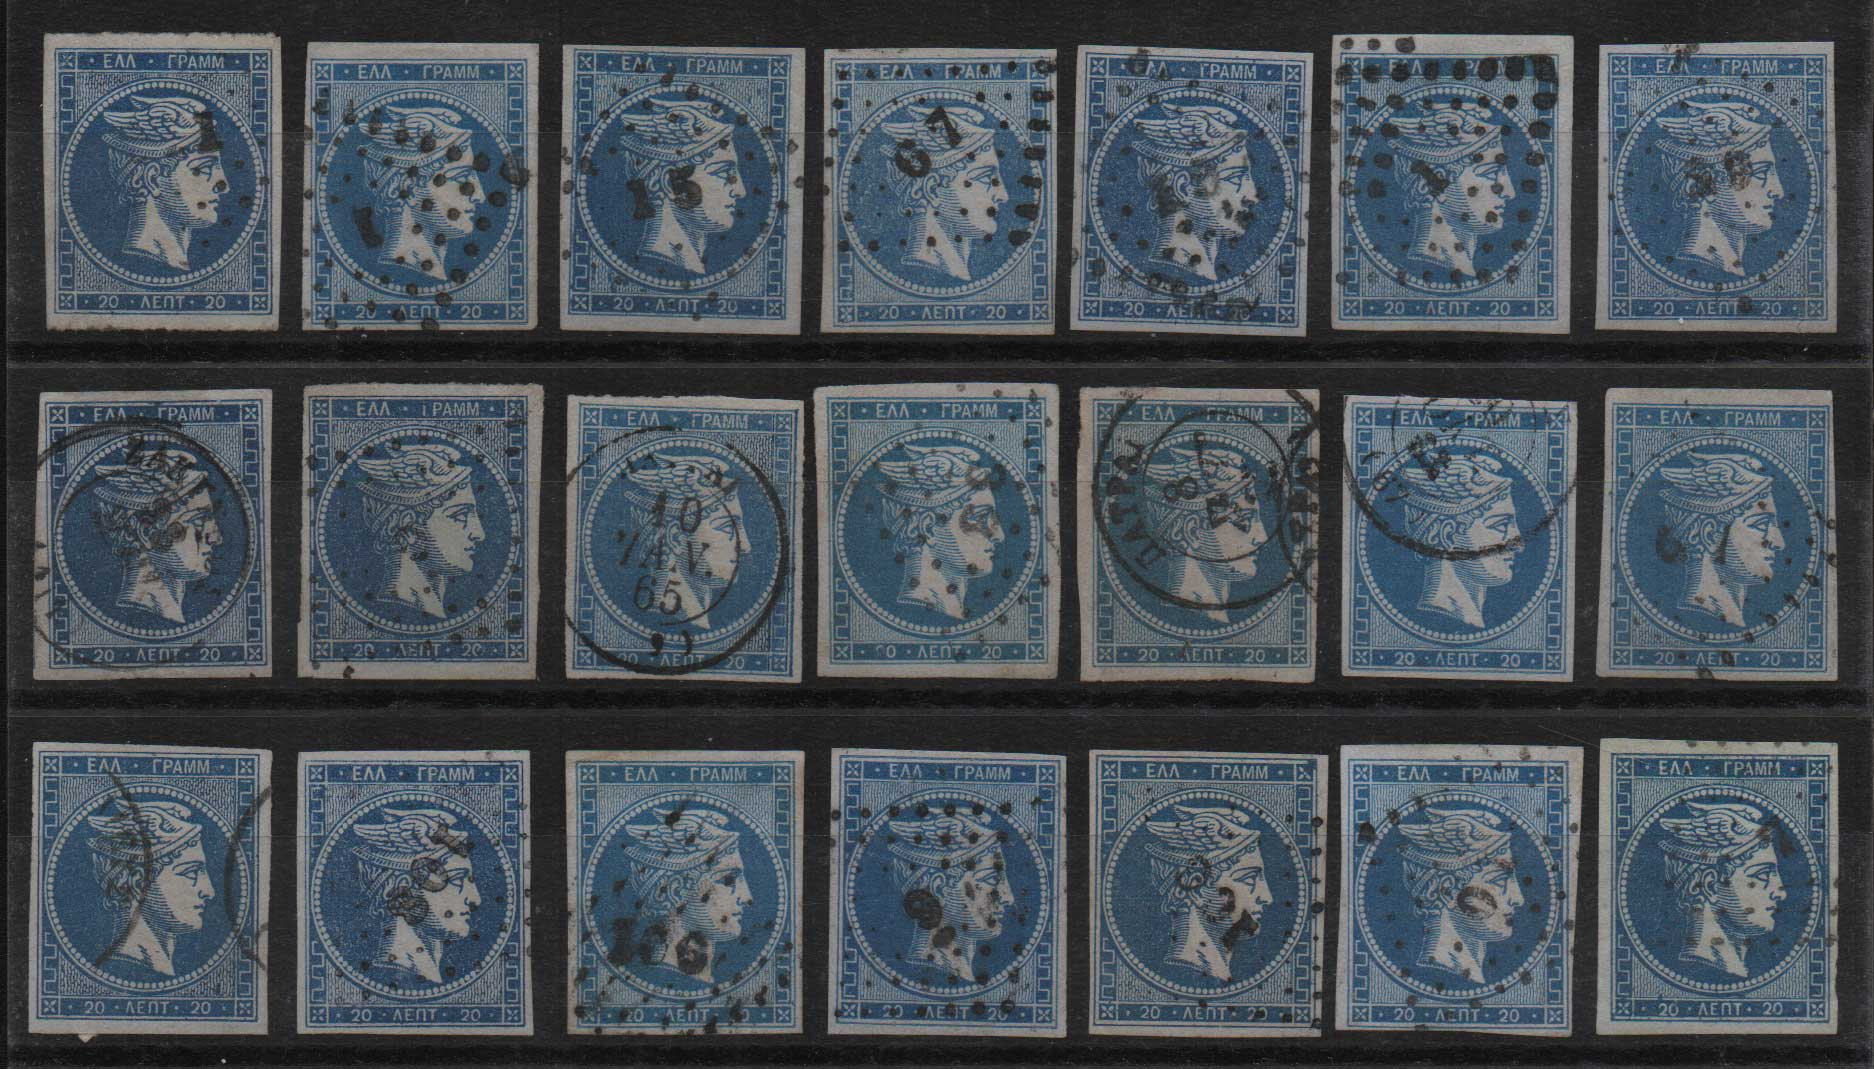 Lot 11 - -  LARGE HERMES HEAD large hermes head -  Athens Auctions Public Auction 84 General Stamp Sale